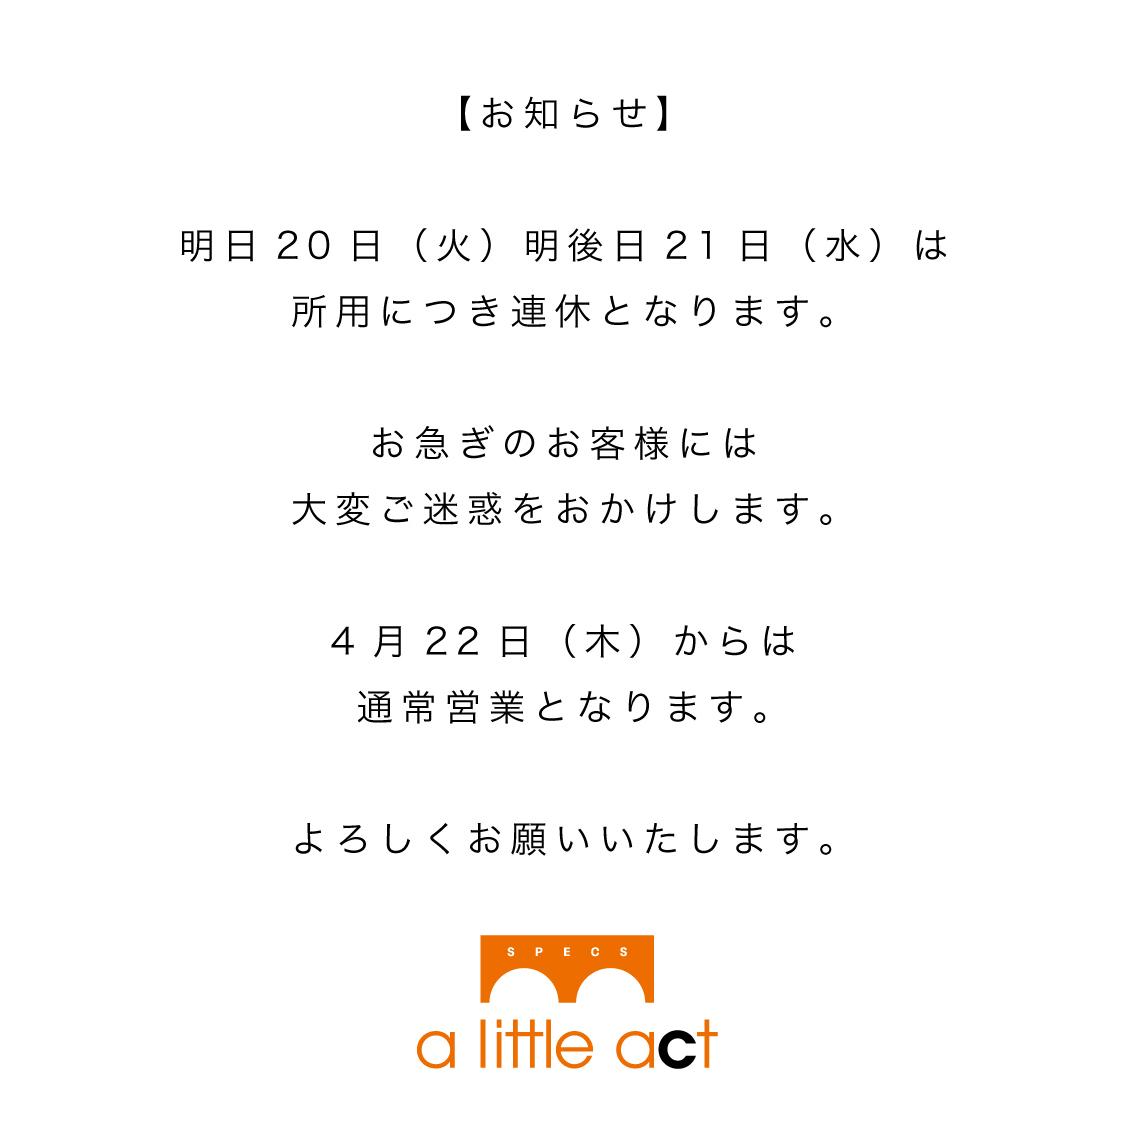 f:id:alittleact:20210419140004j:plain